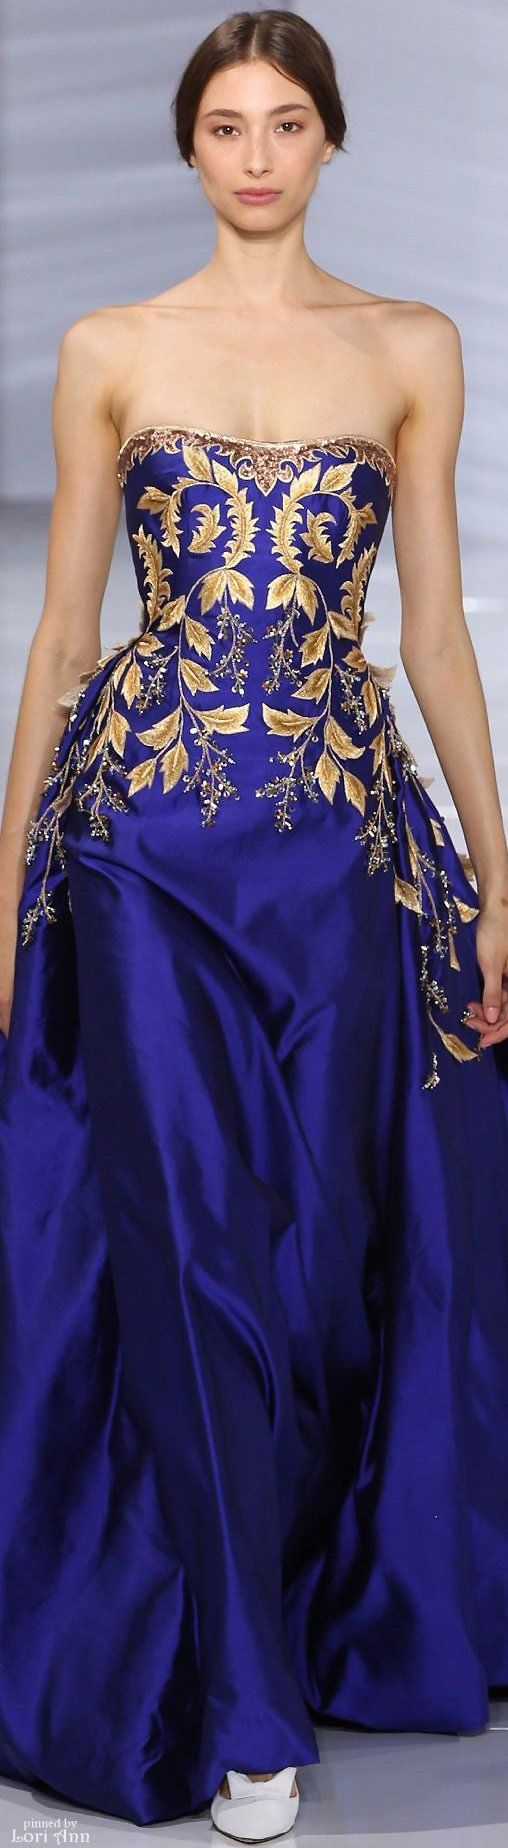 best fashion images on pinterest fashion show fashion